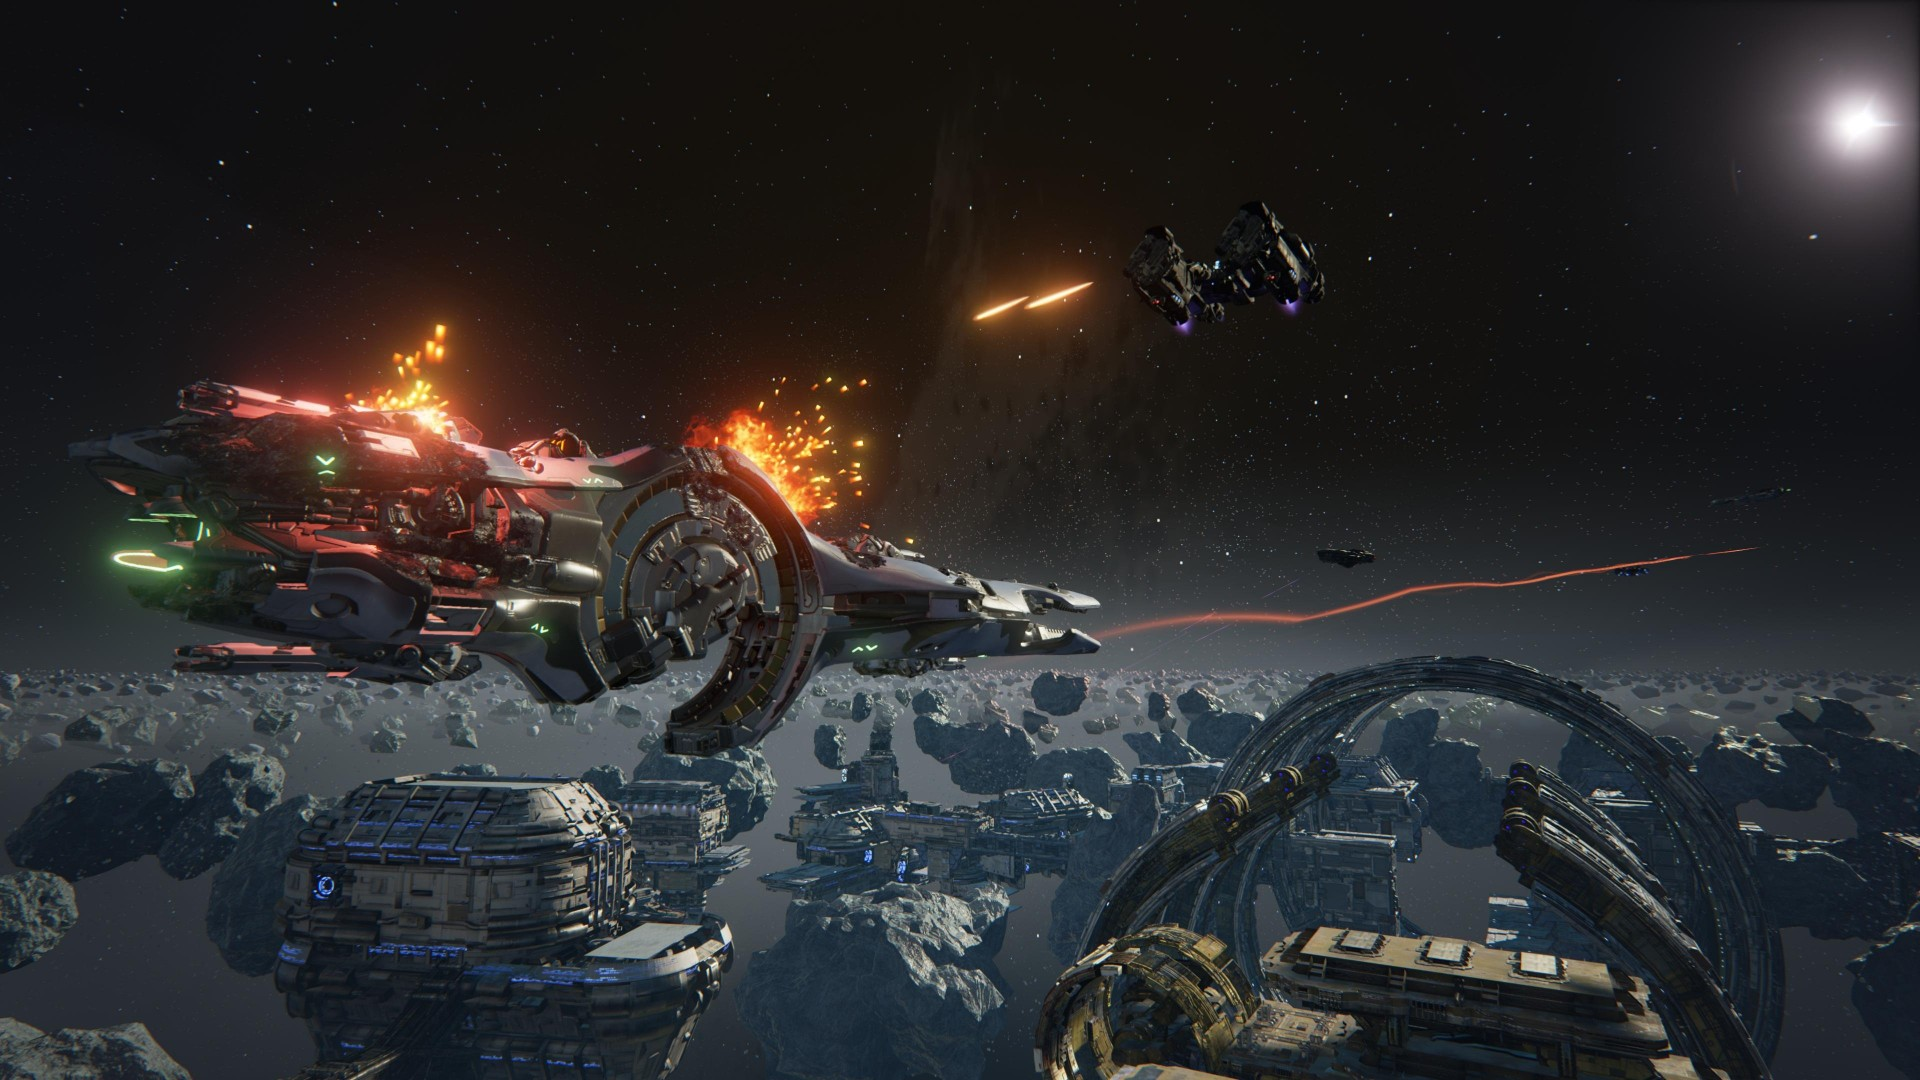 Wallpaper Dreadnought Space Ship Pc Ps 4 Xbox One